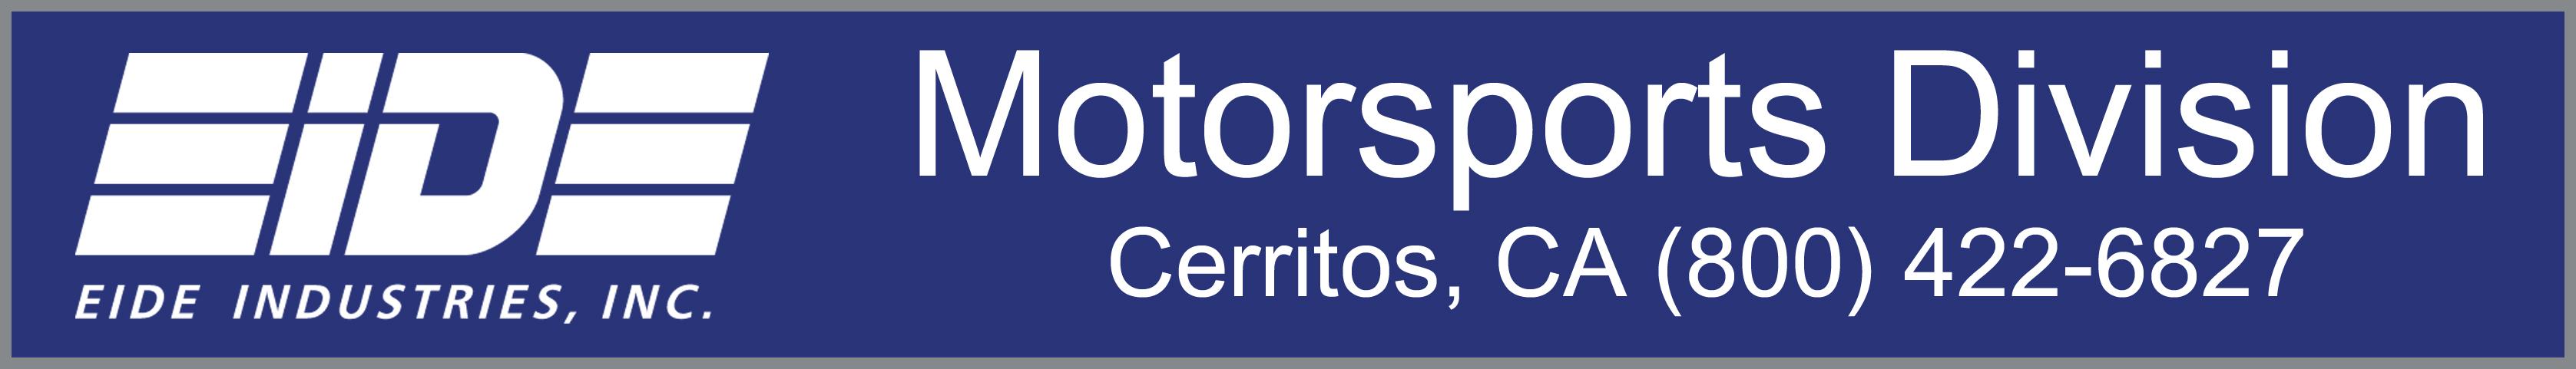 Transporter | Race | Event | Motor Sport | Trailer - Awning & Canopy